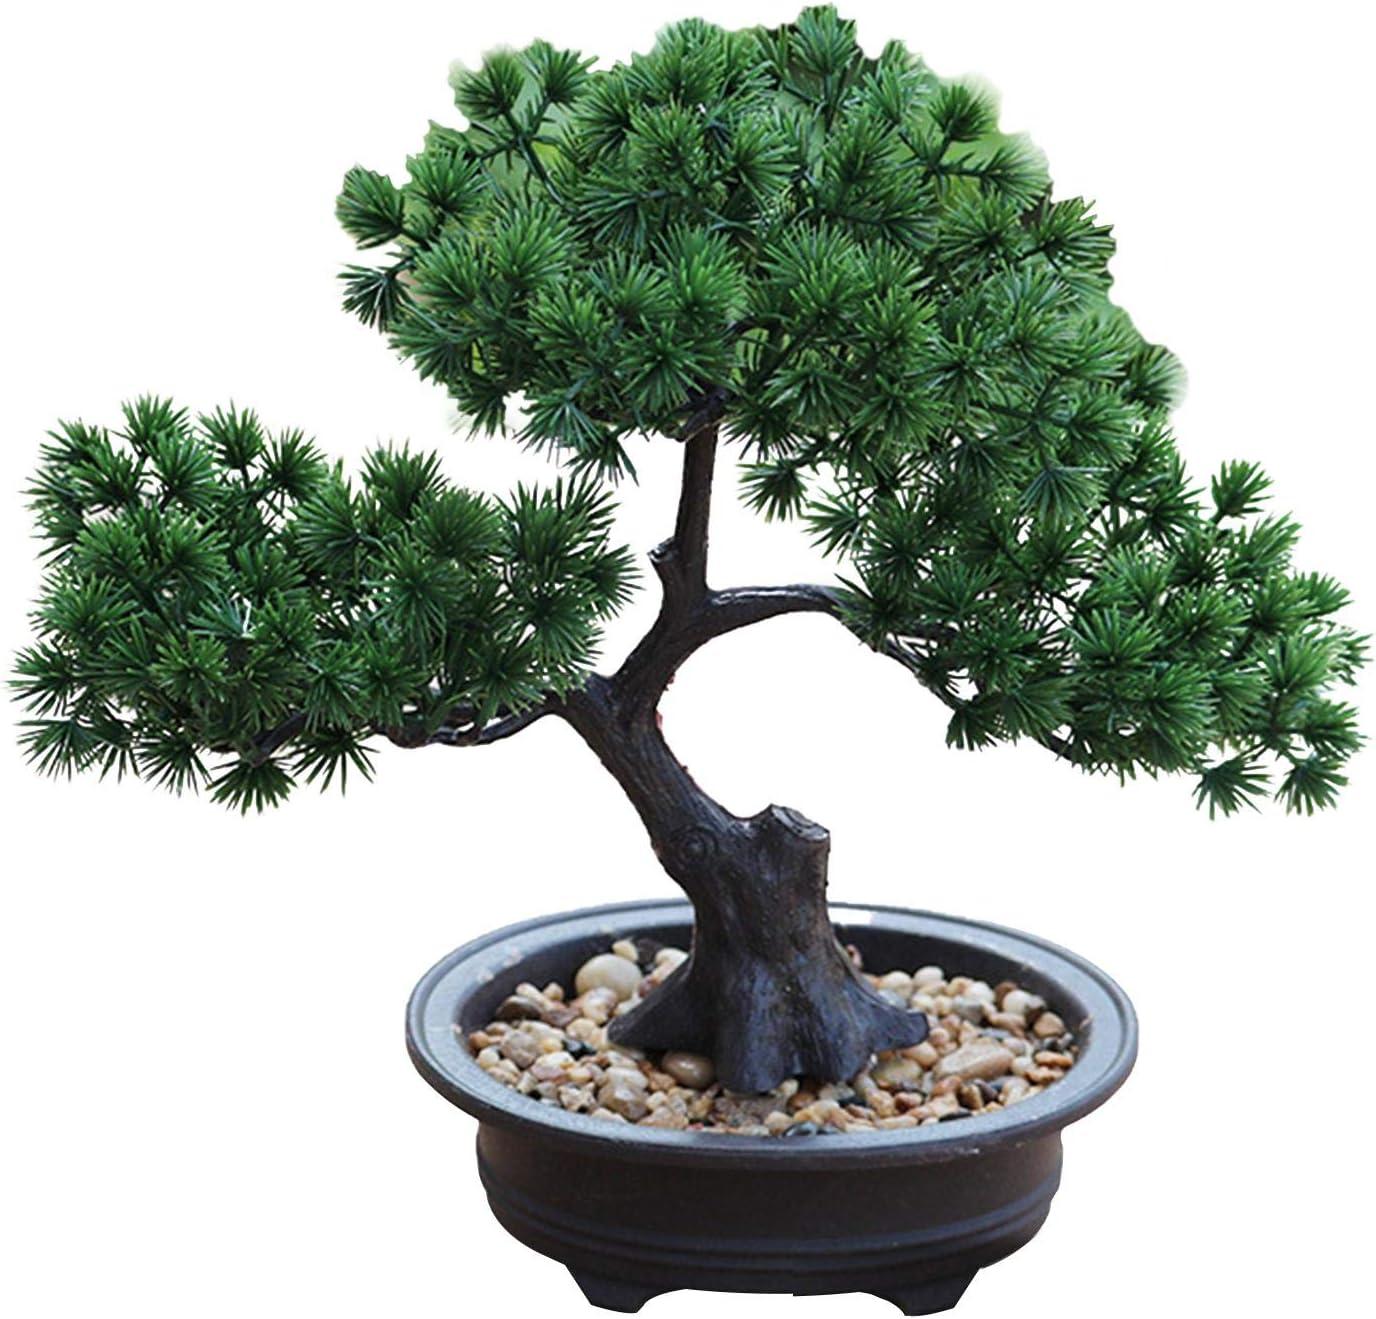 Artificial Bonsai Pine Tree, Fake Desk Plants Room Decor for Desktop Display Simulation Office Living Room Zen Garden Decoration Indoor Home Décor